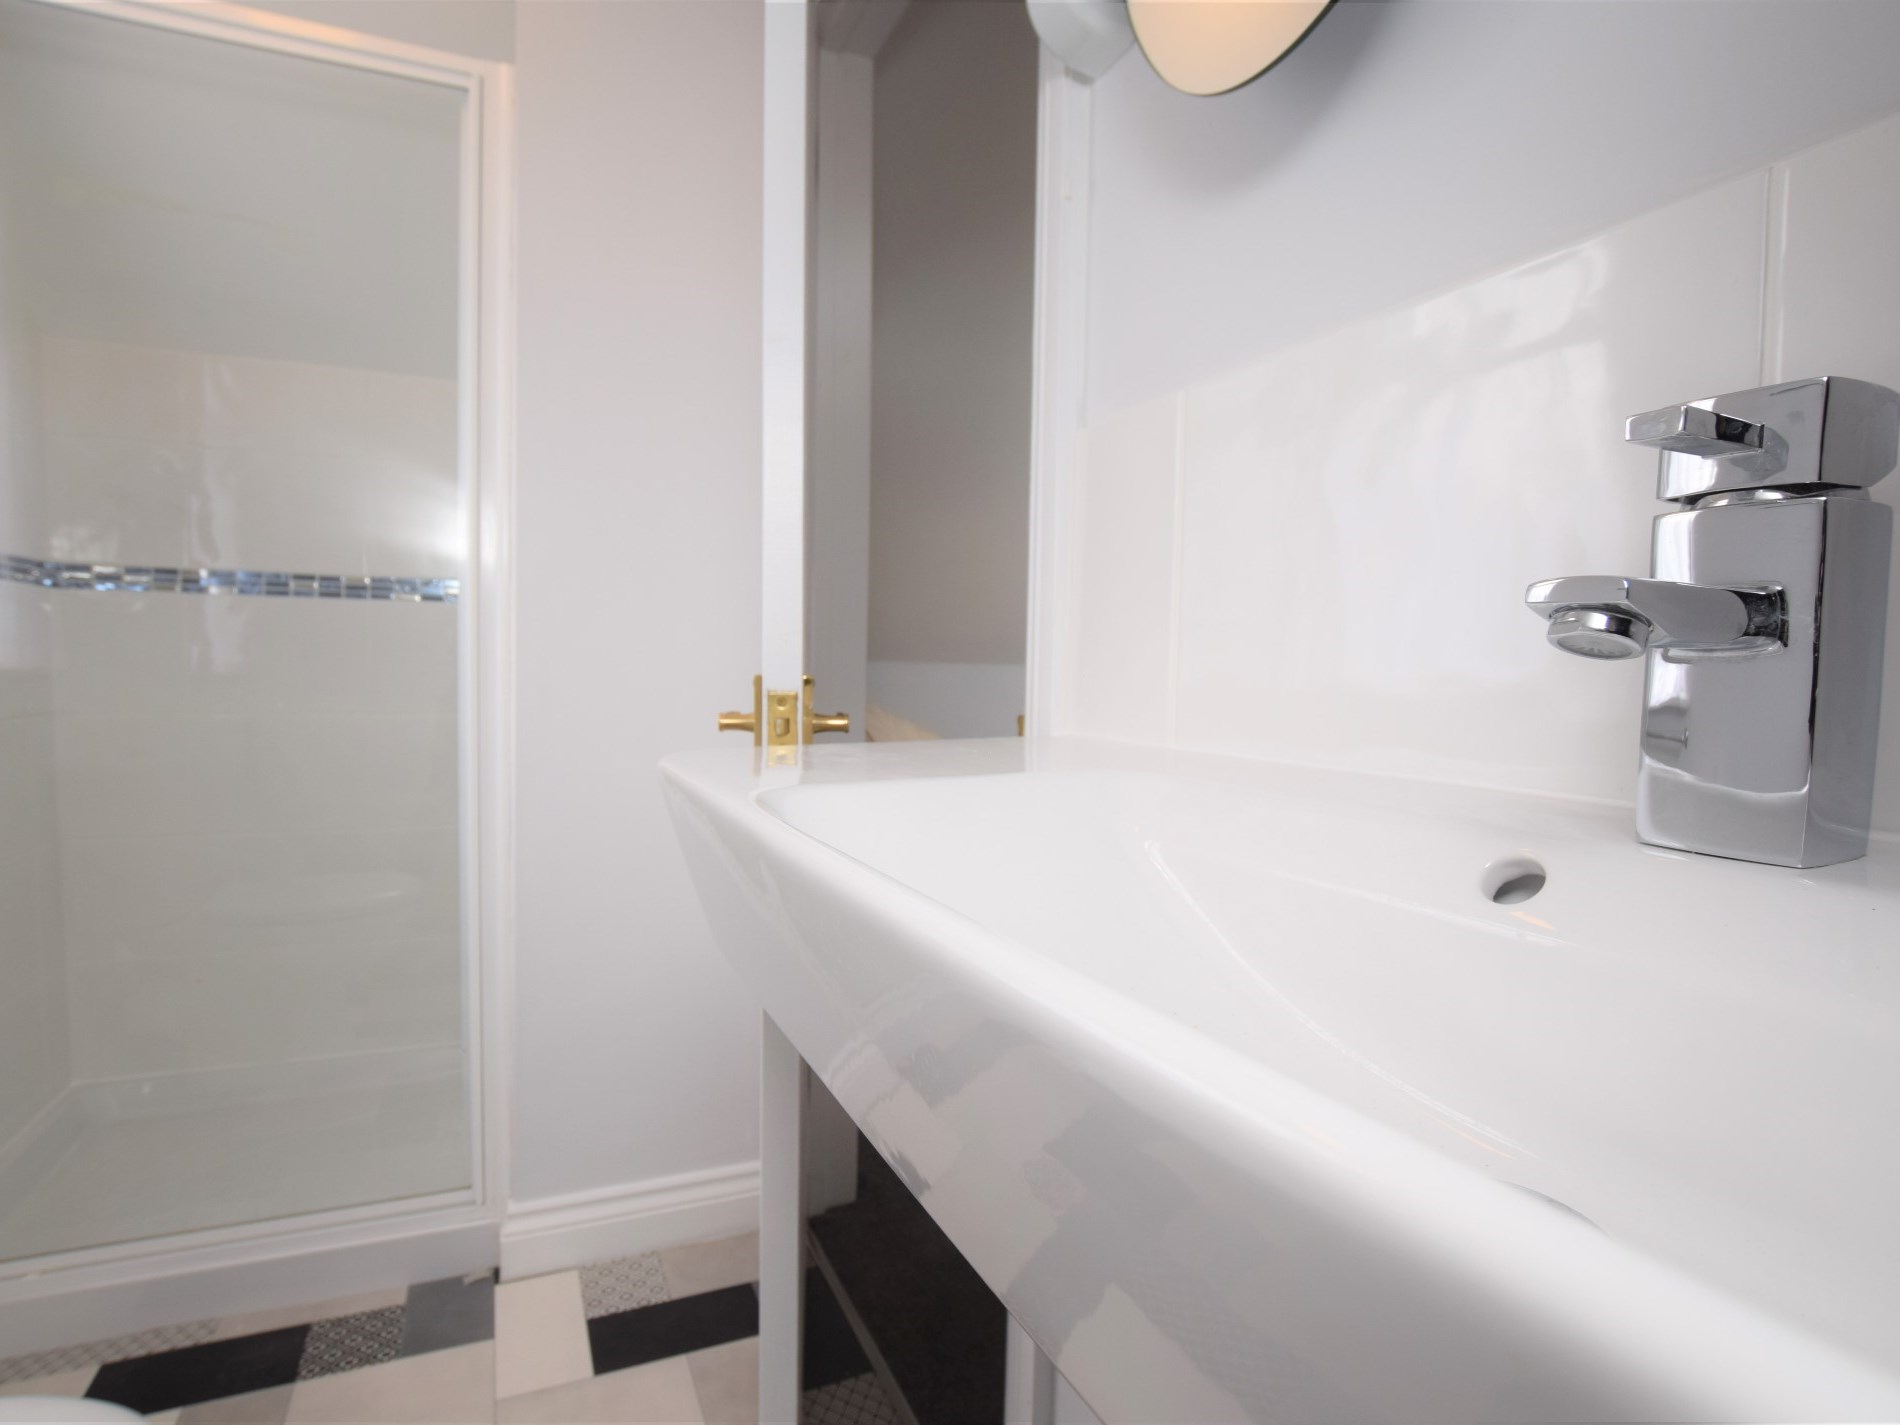 The contemporary shower room